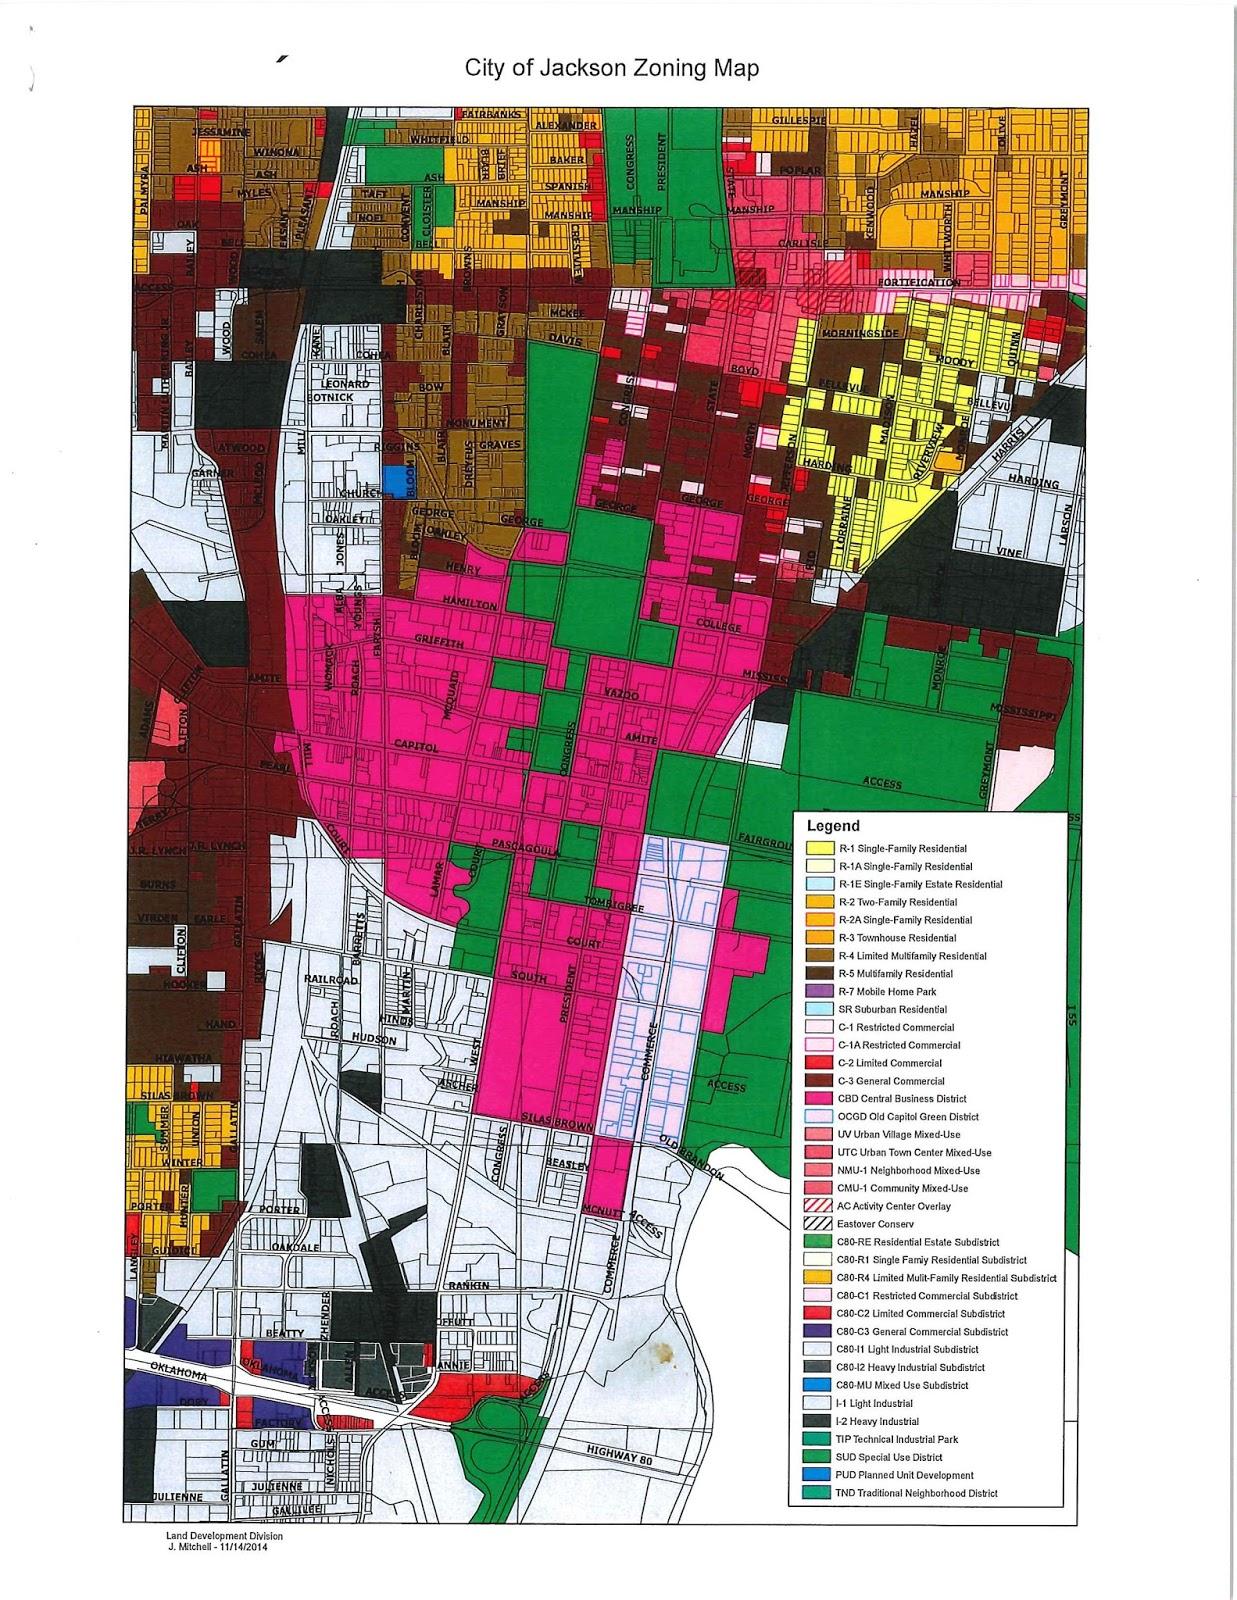 City Of Jackson Mississippi Zoning Map